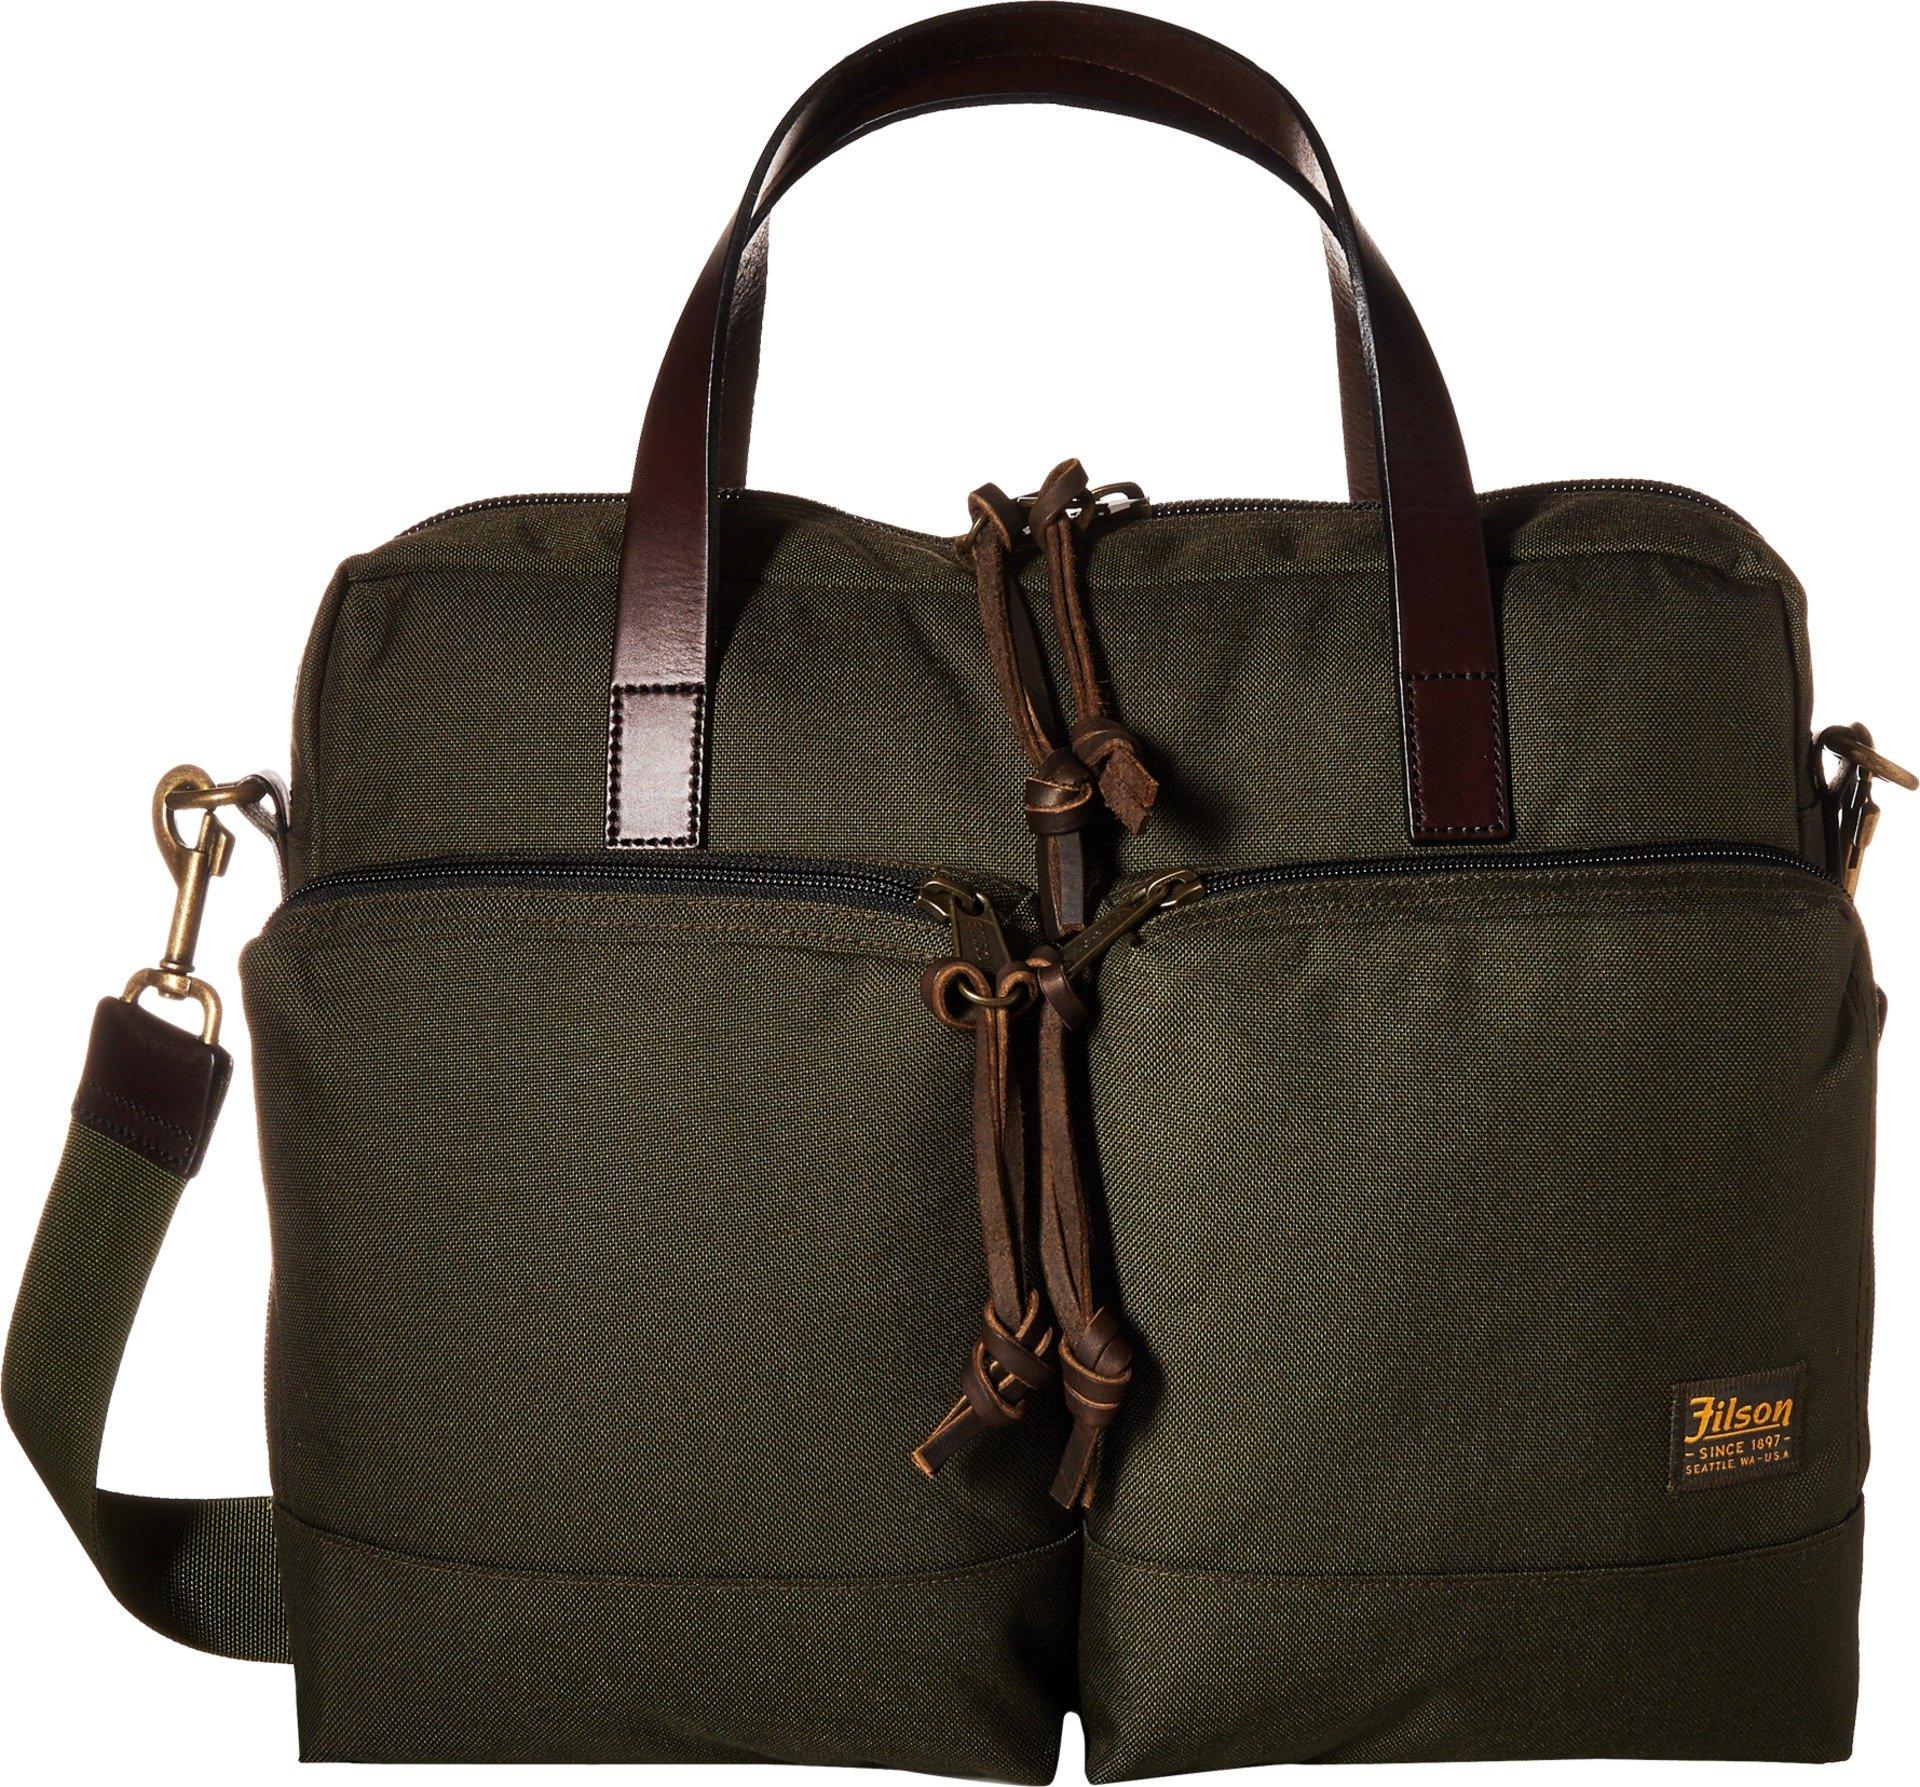 Filson Men's Dryden Briefcase, Otter Green, One Size